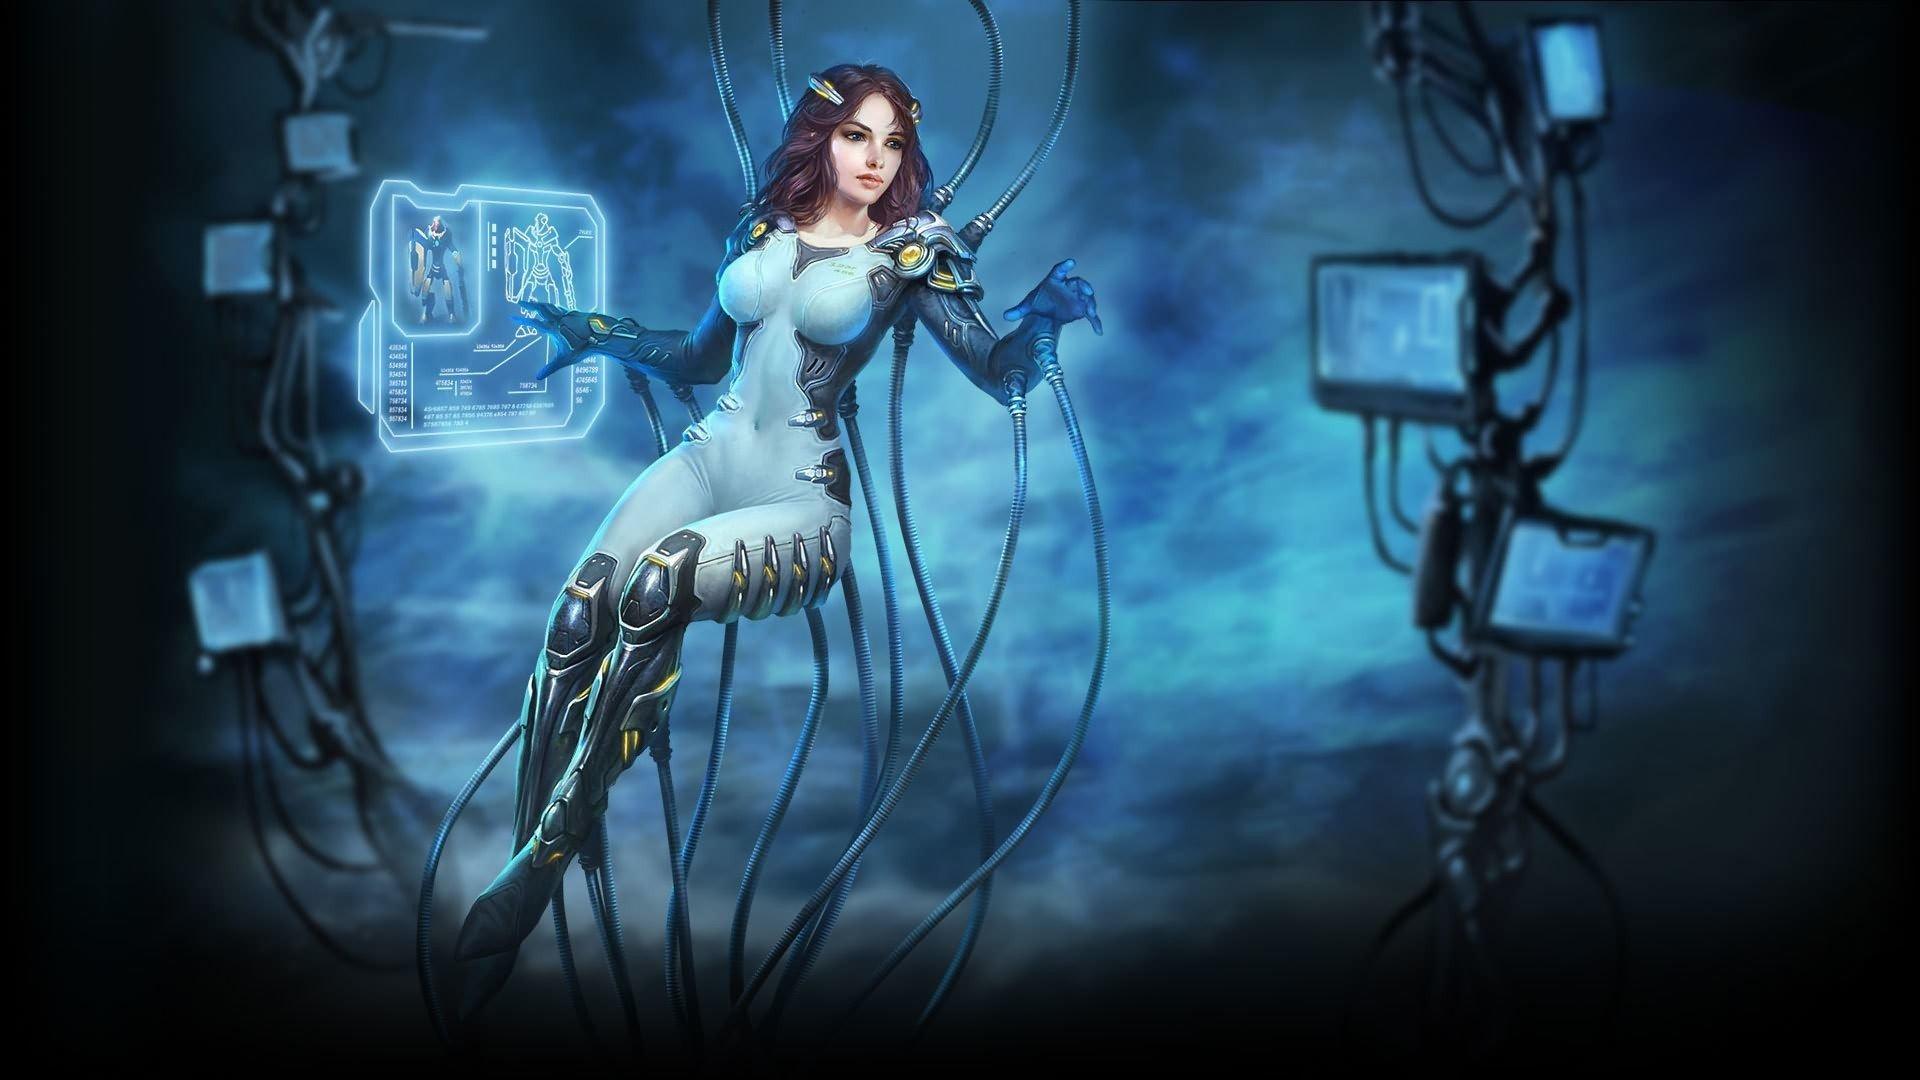 women, Fantasy art Wallpaper